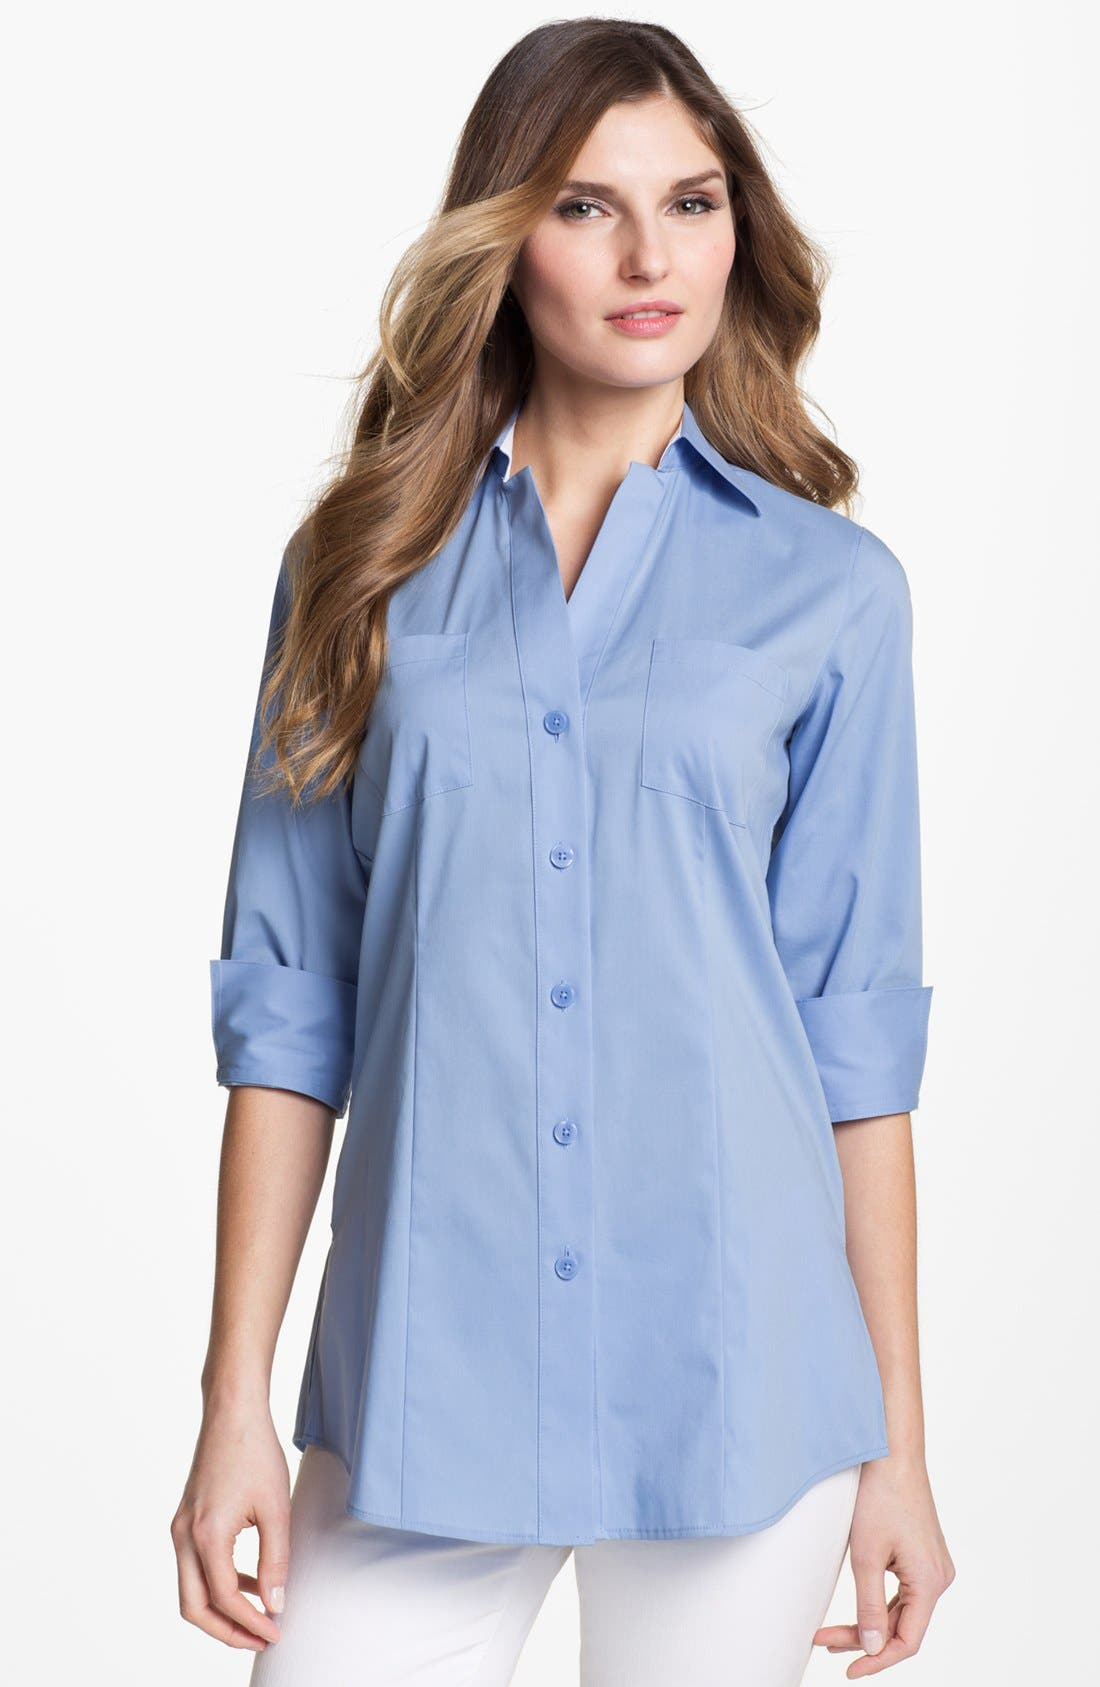 Main Image - Foxcroft Three Quarter Sleeve Shaped Shirt